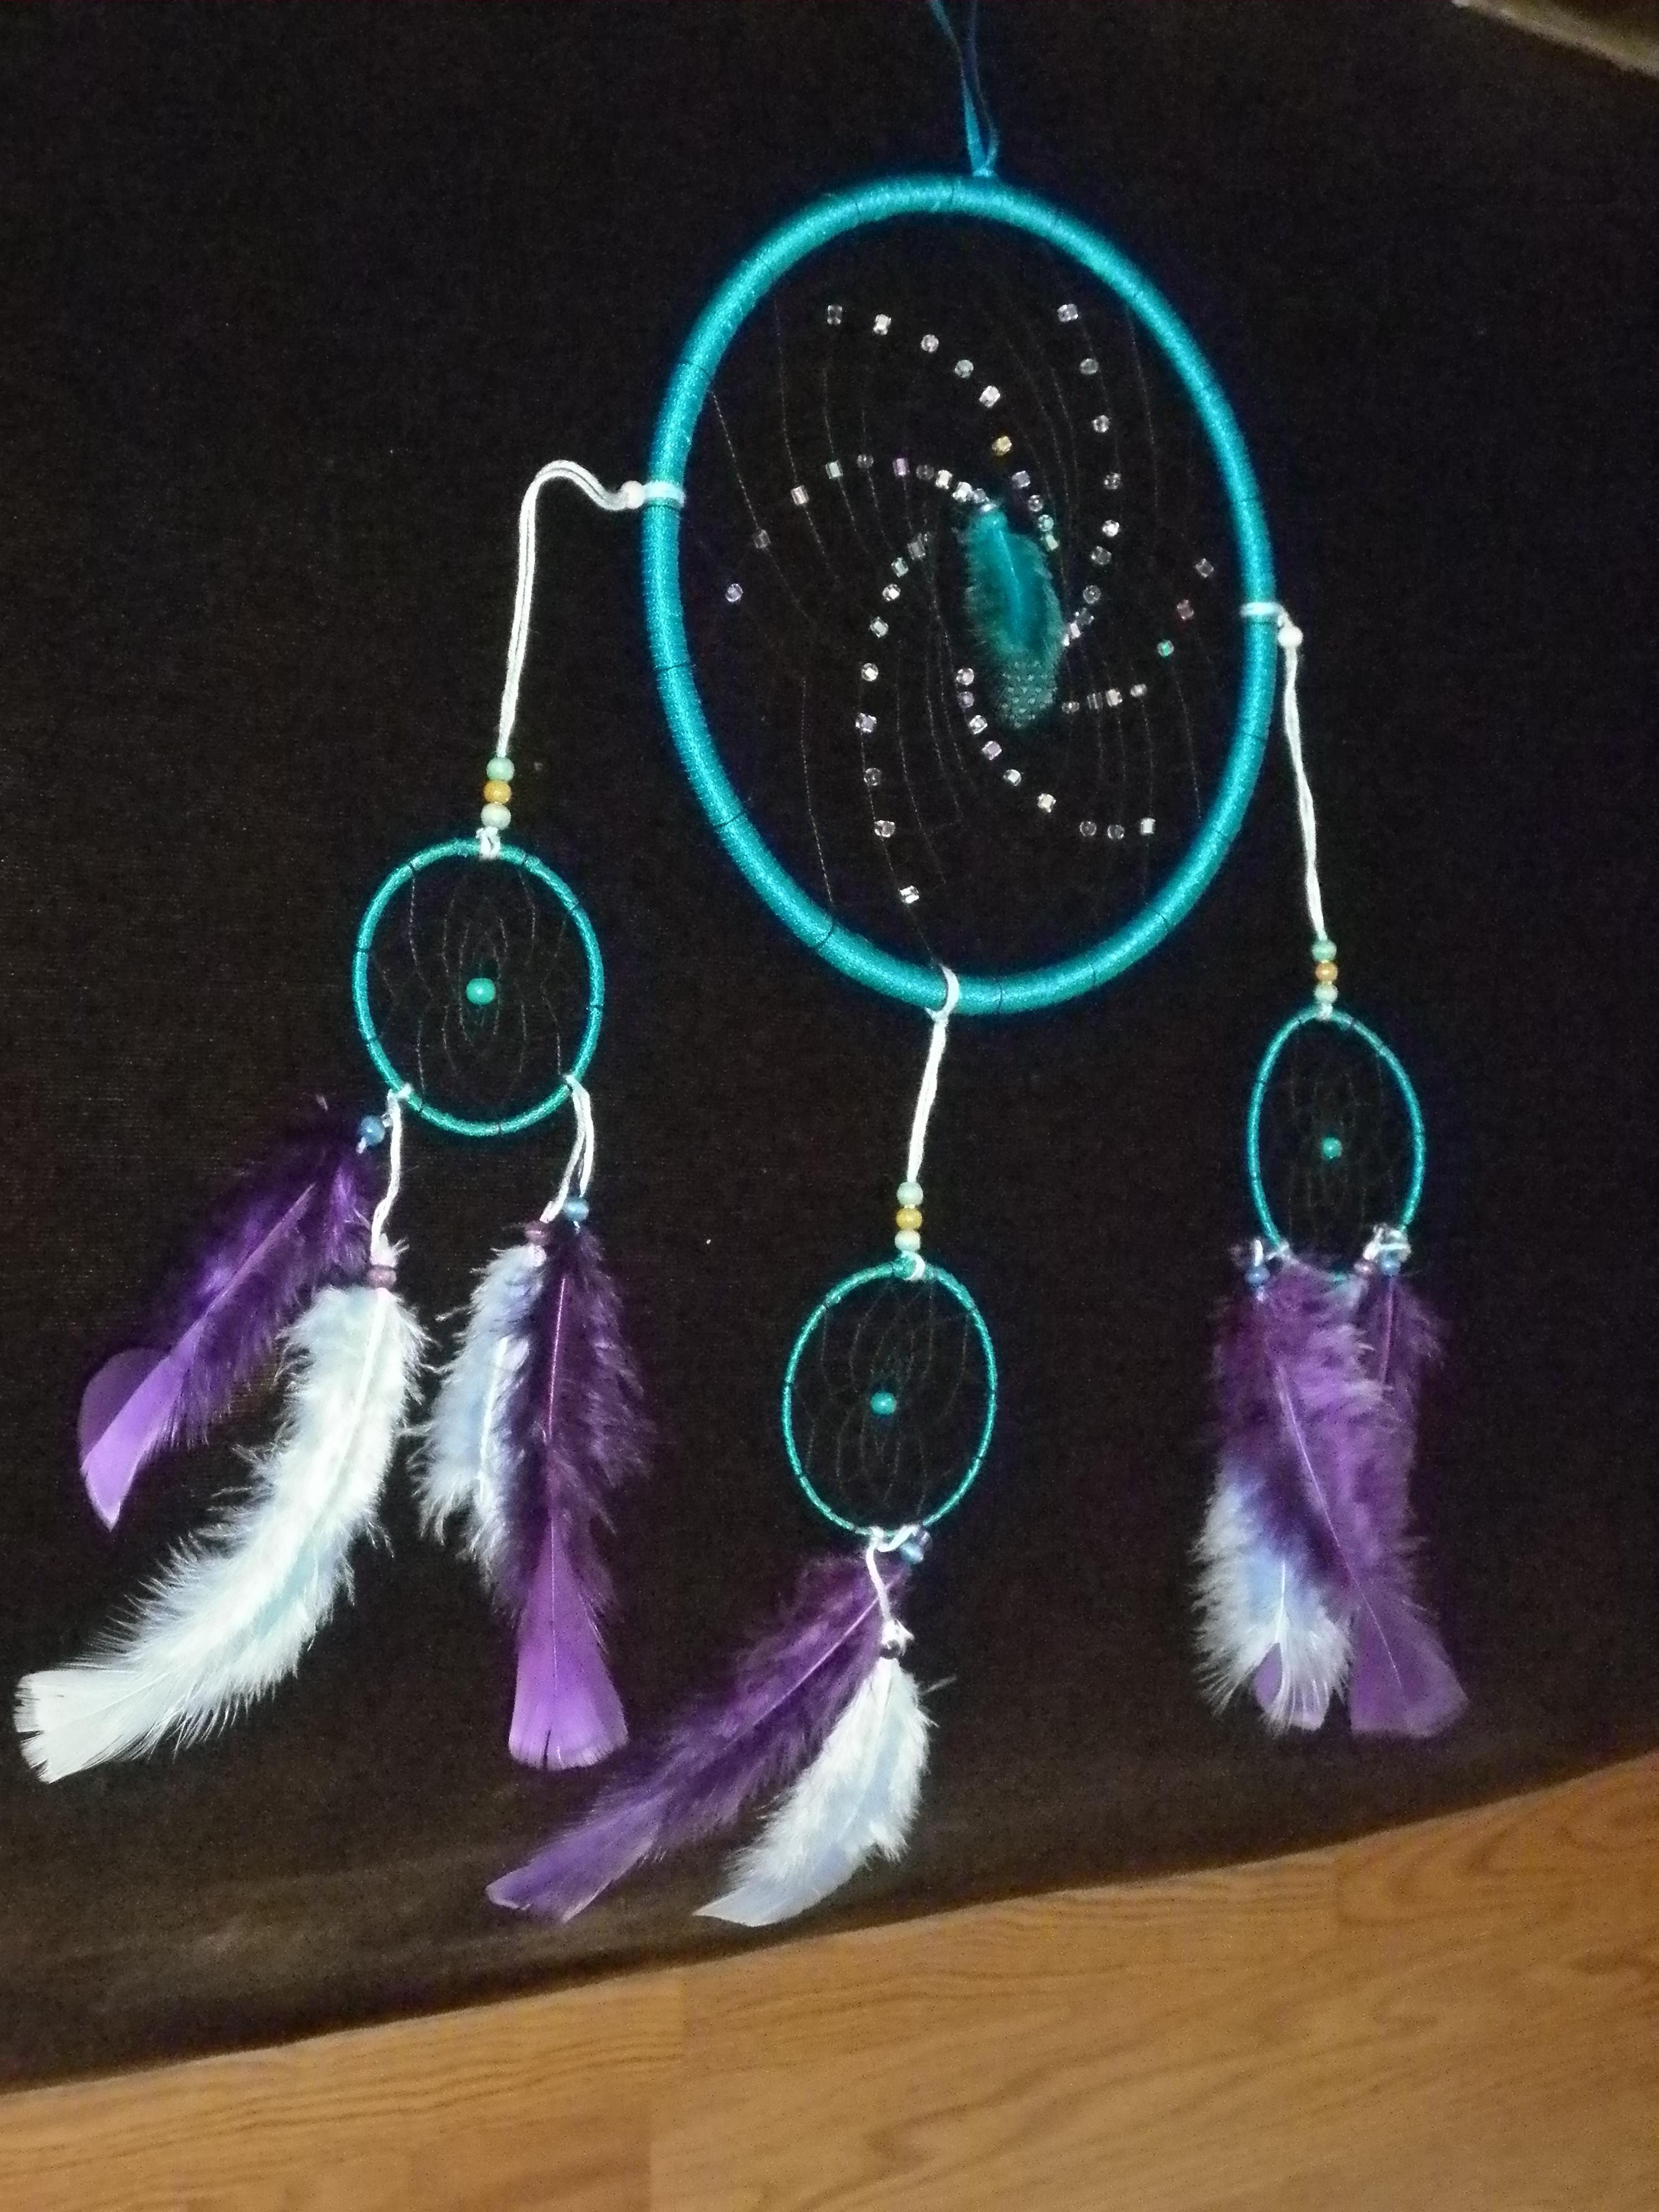 My dream catcher designs by hildeart on deviantart for What do dreamcatchers do